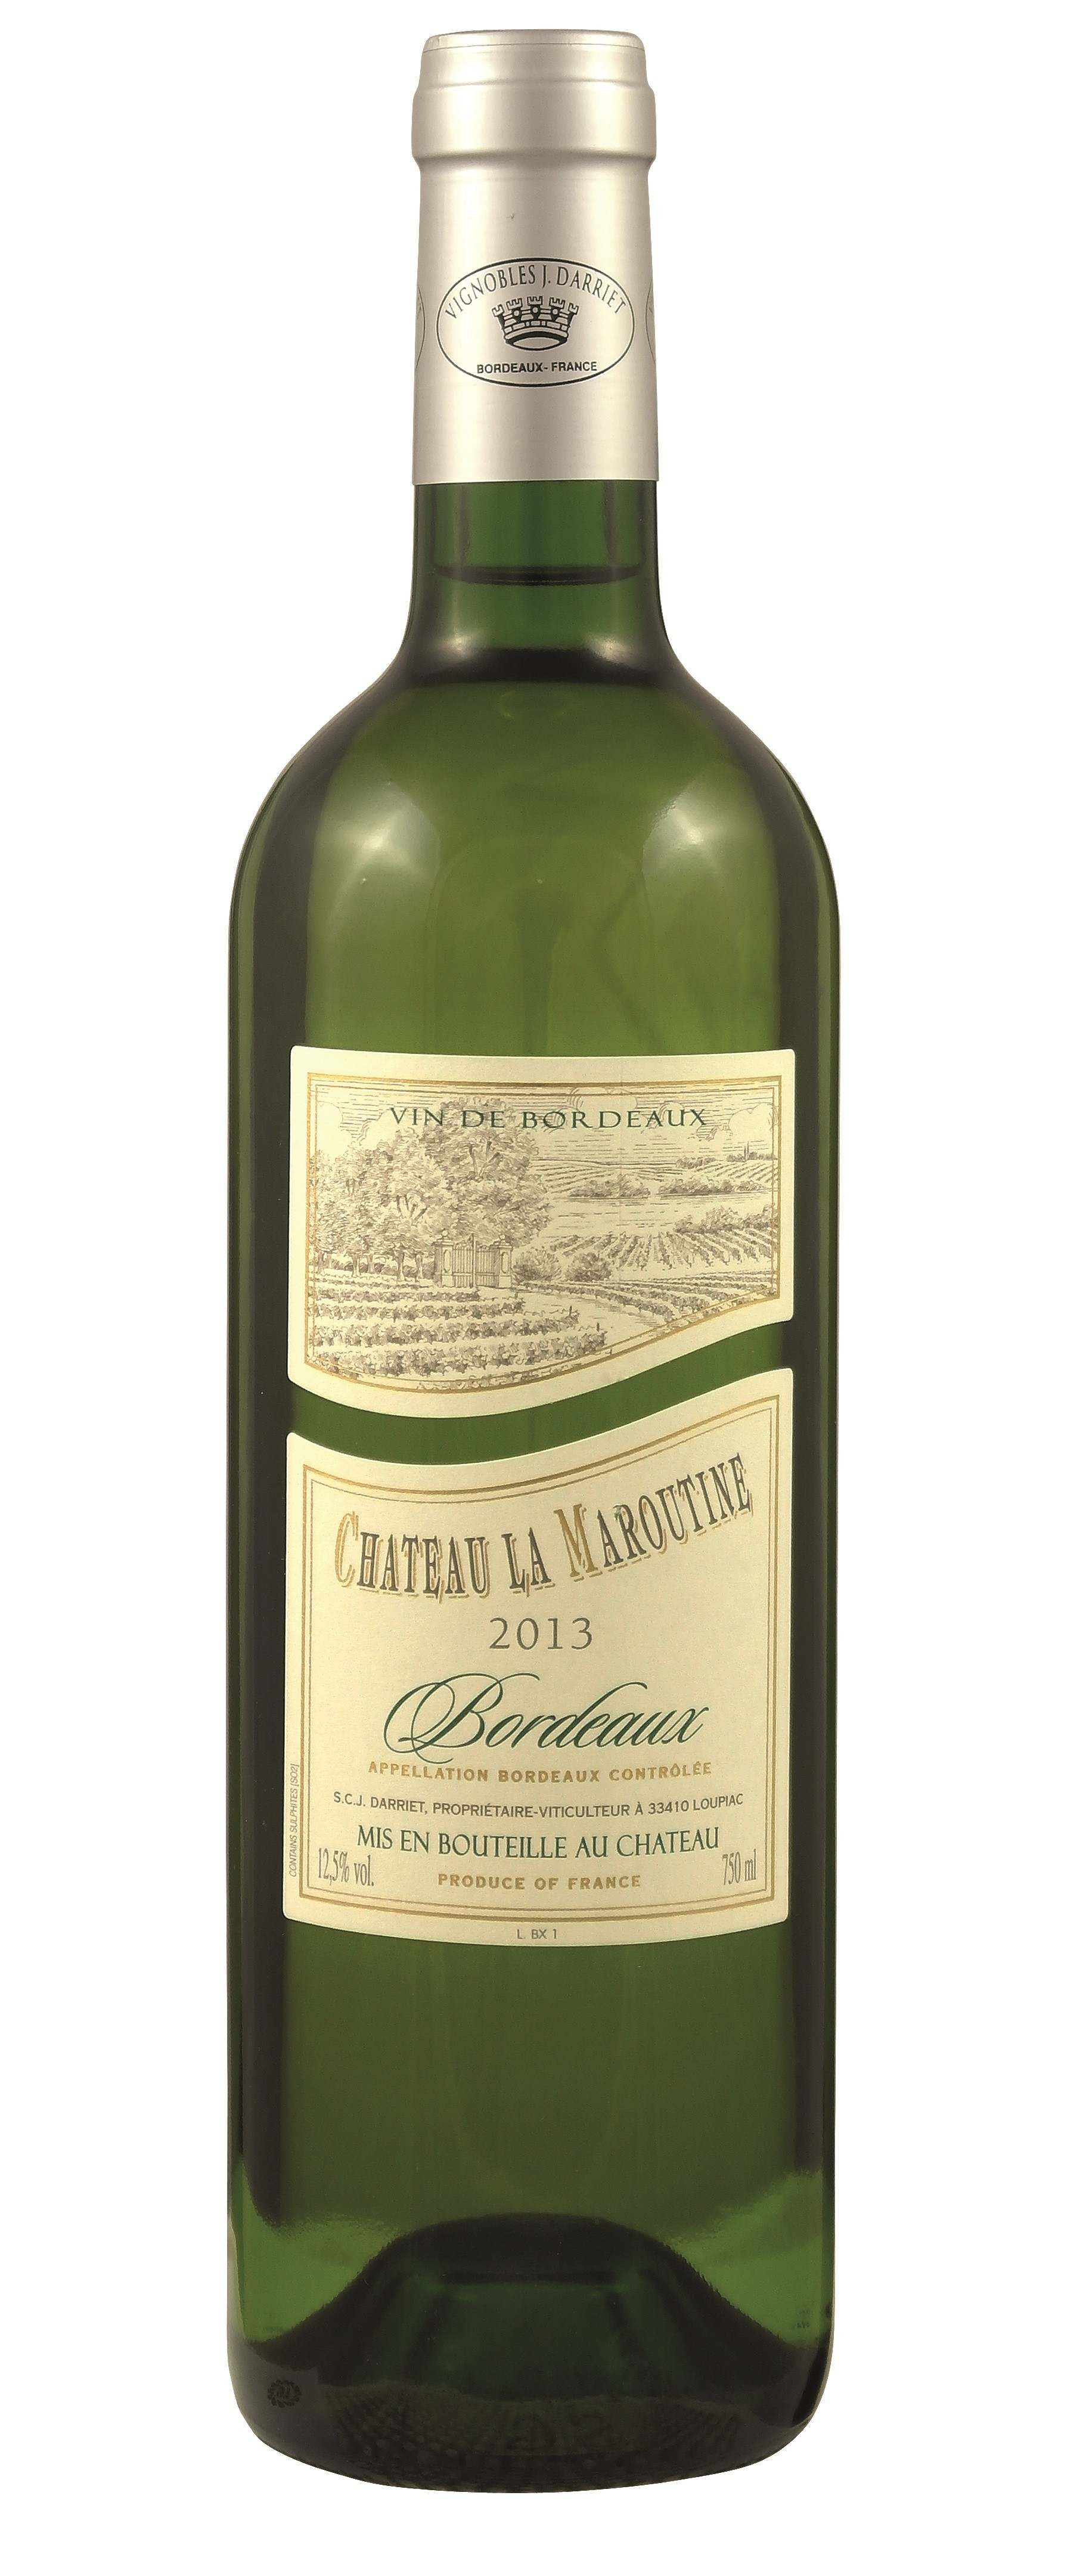 Chateau la Maroutine white 2018, 0,375 l, Bordeaux AOC